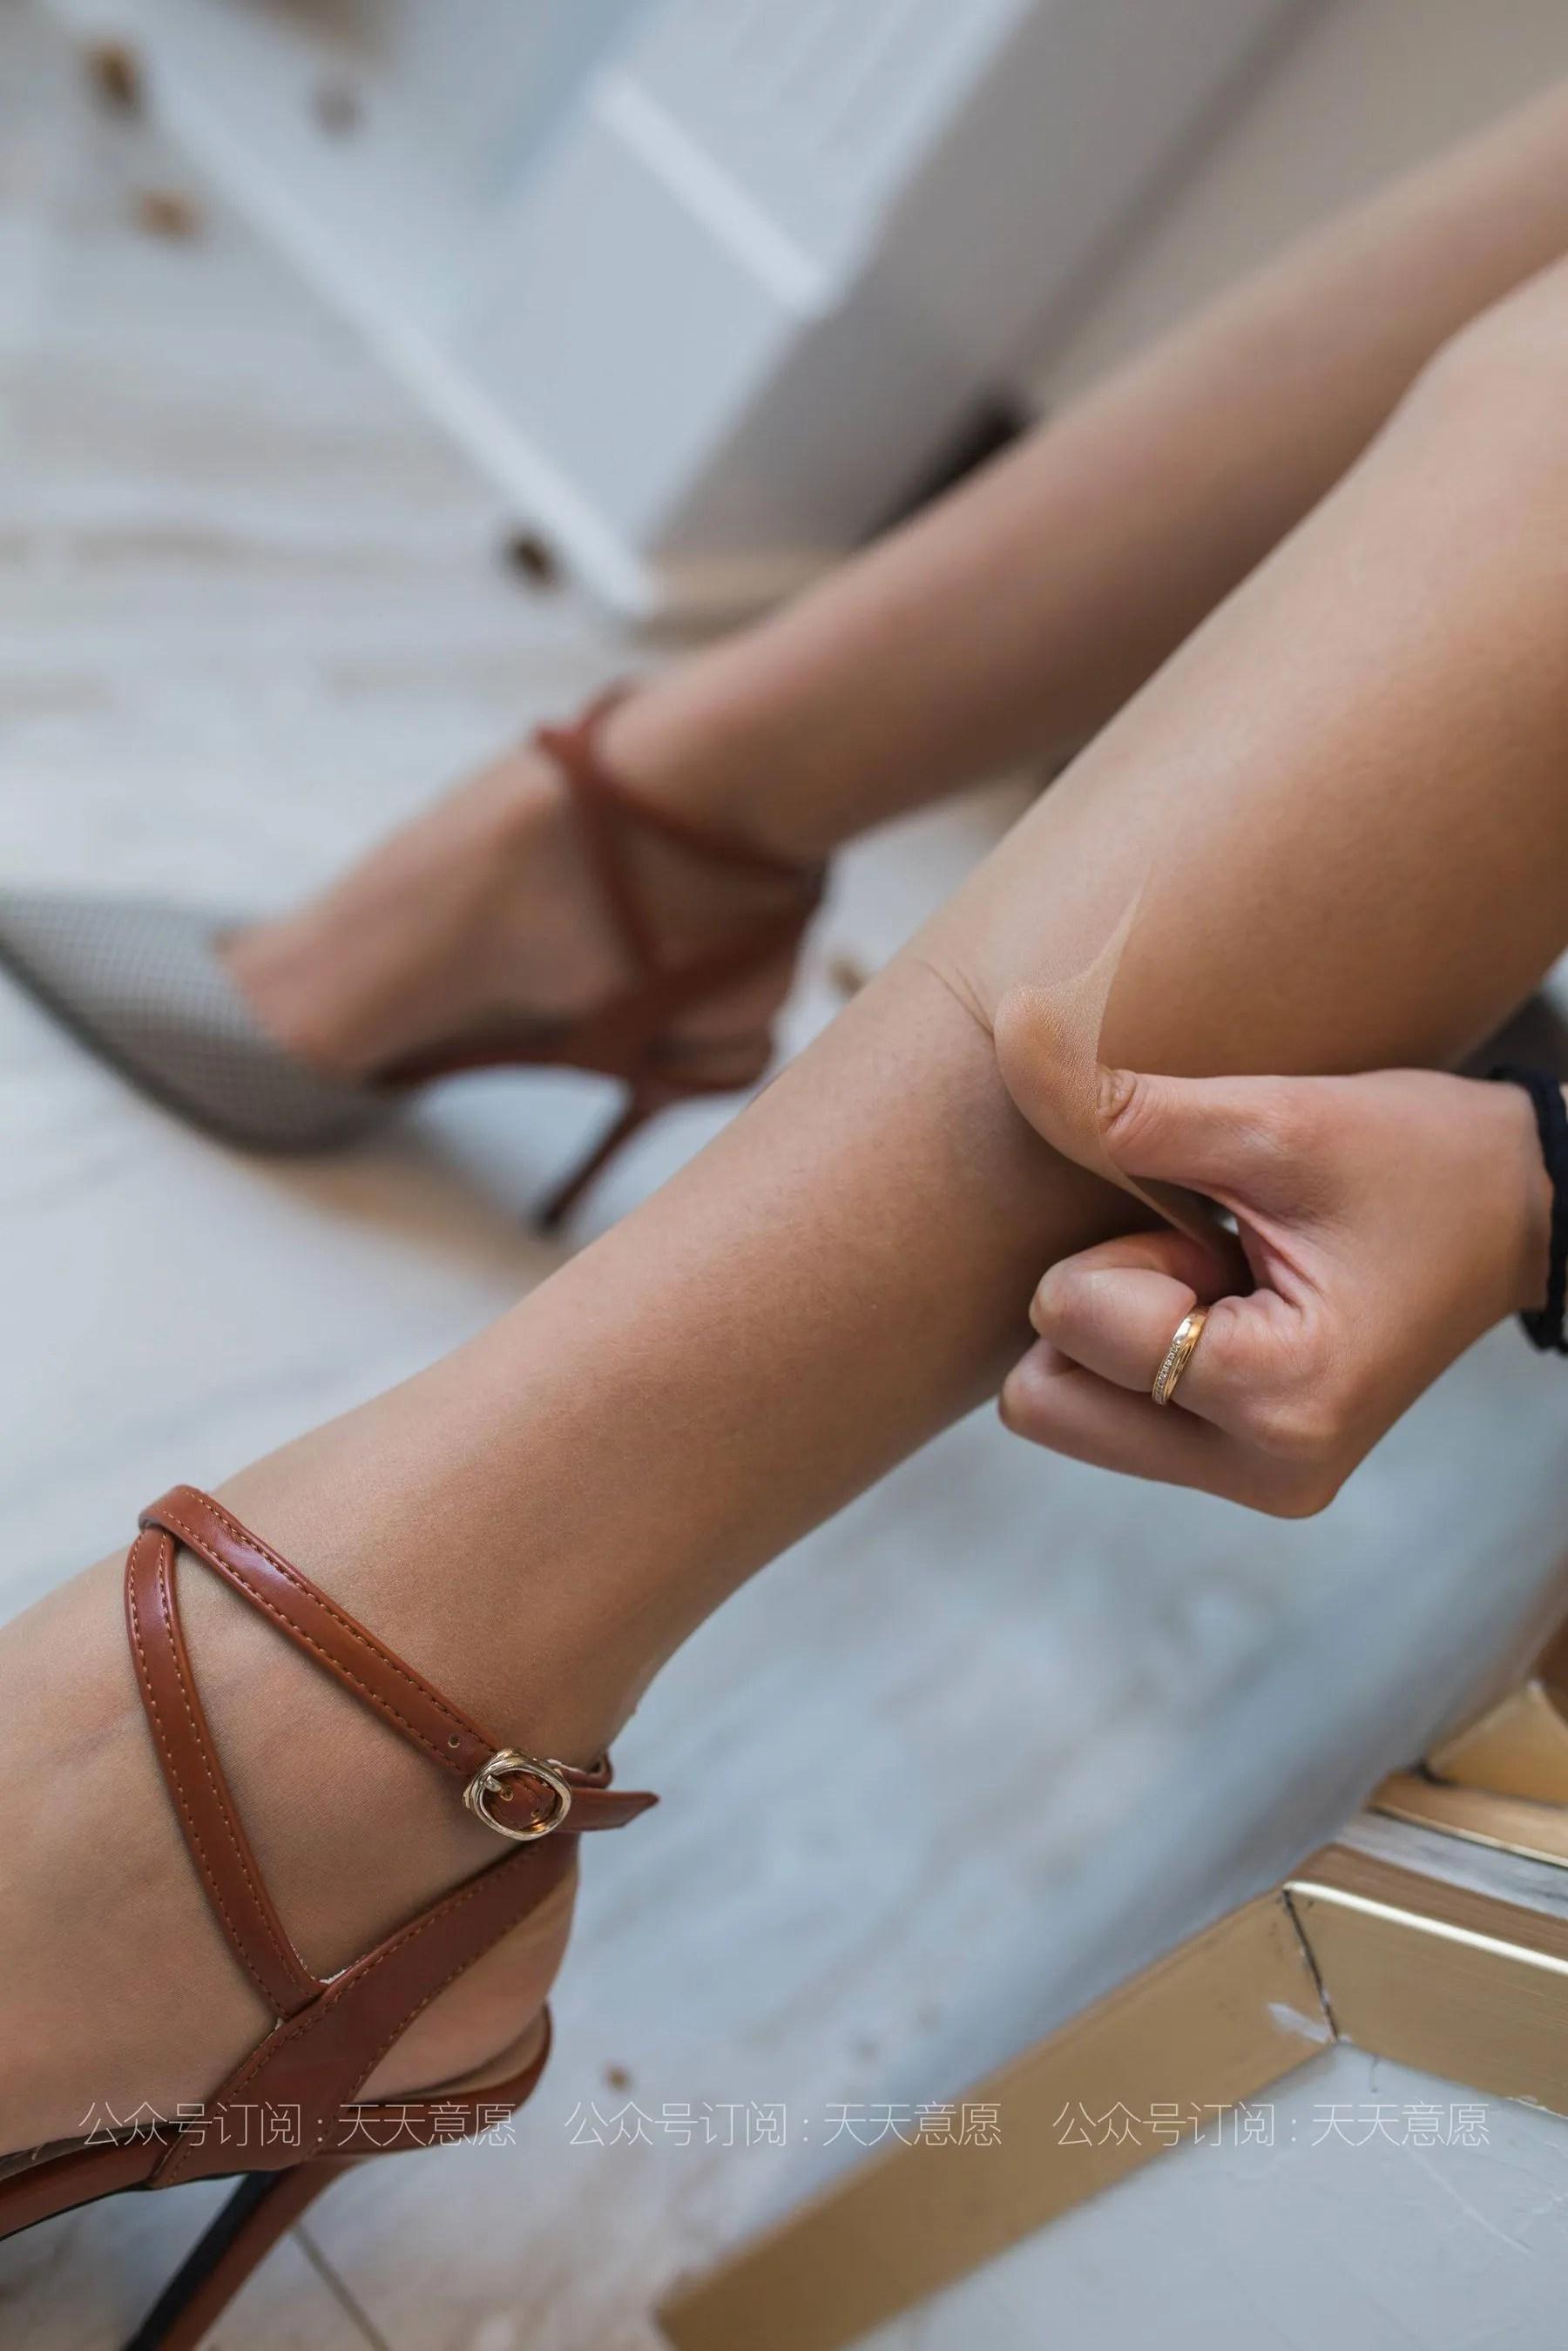 [IESS] 丝享家 770 婉萍《邻家甜美女孩》 丝袜美腿写真[90P]插图(1)